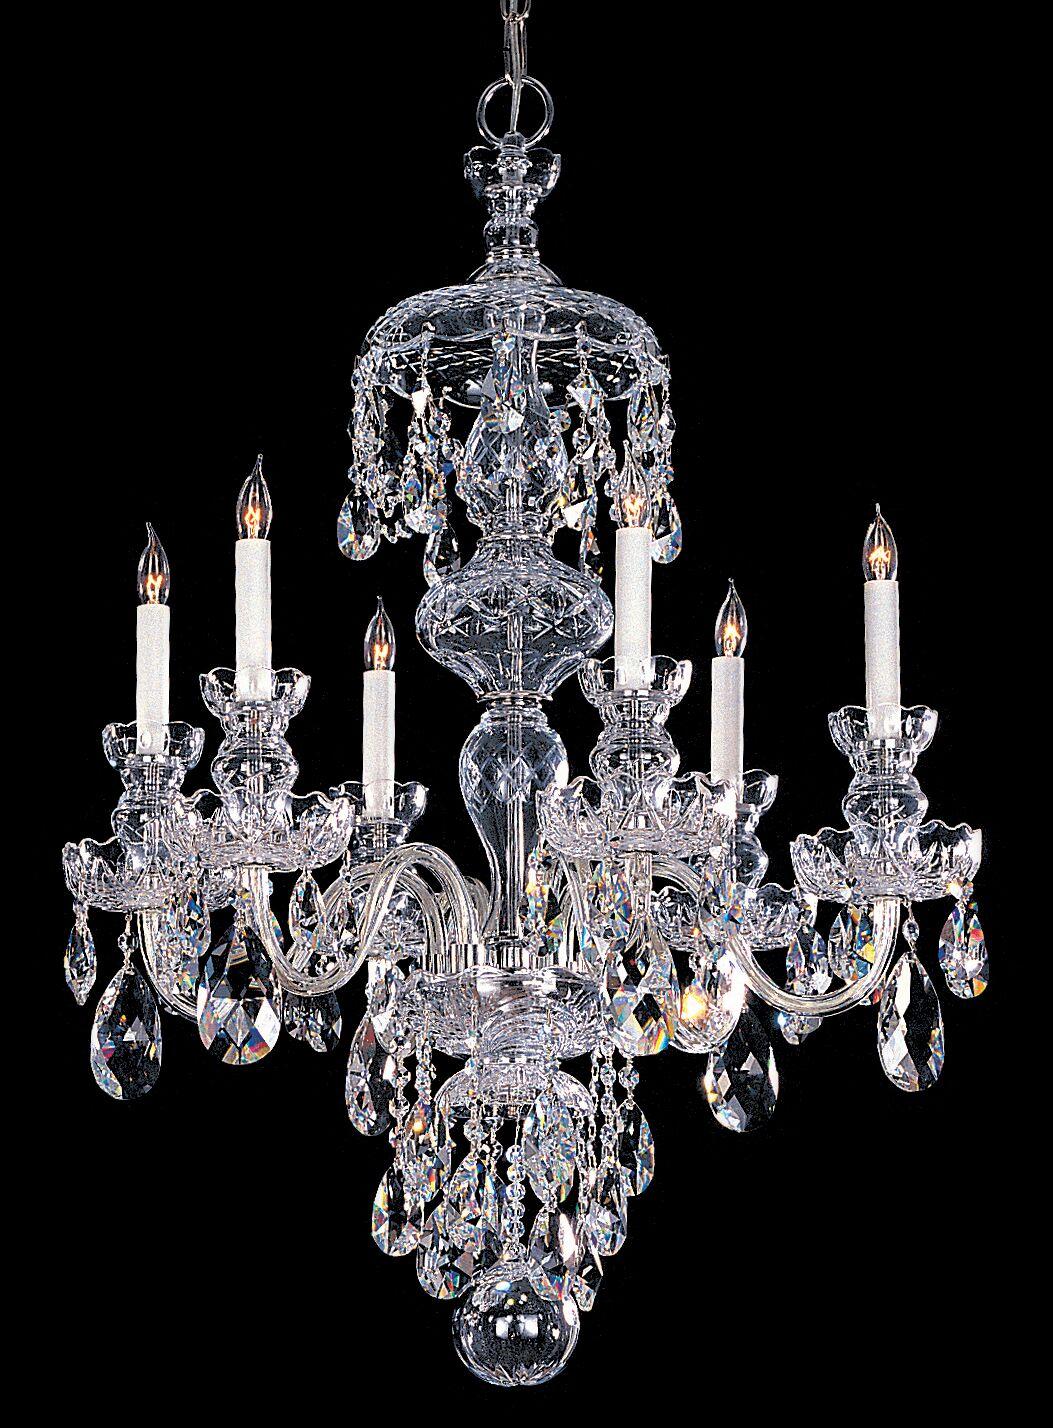 Milan 6-Light Candle Style Chandelier Finish: Chrome, Crystal Type: Majestic Wood Polished